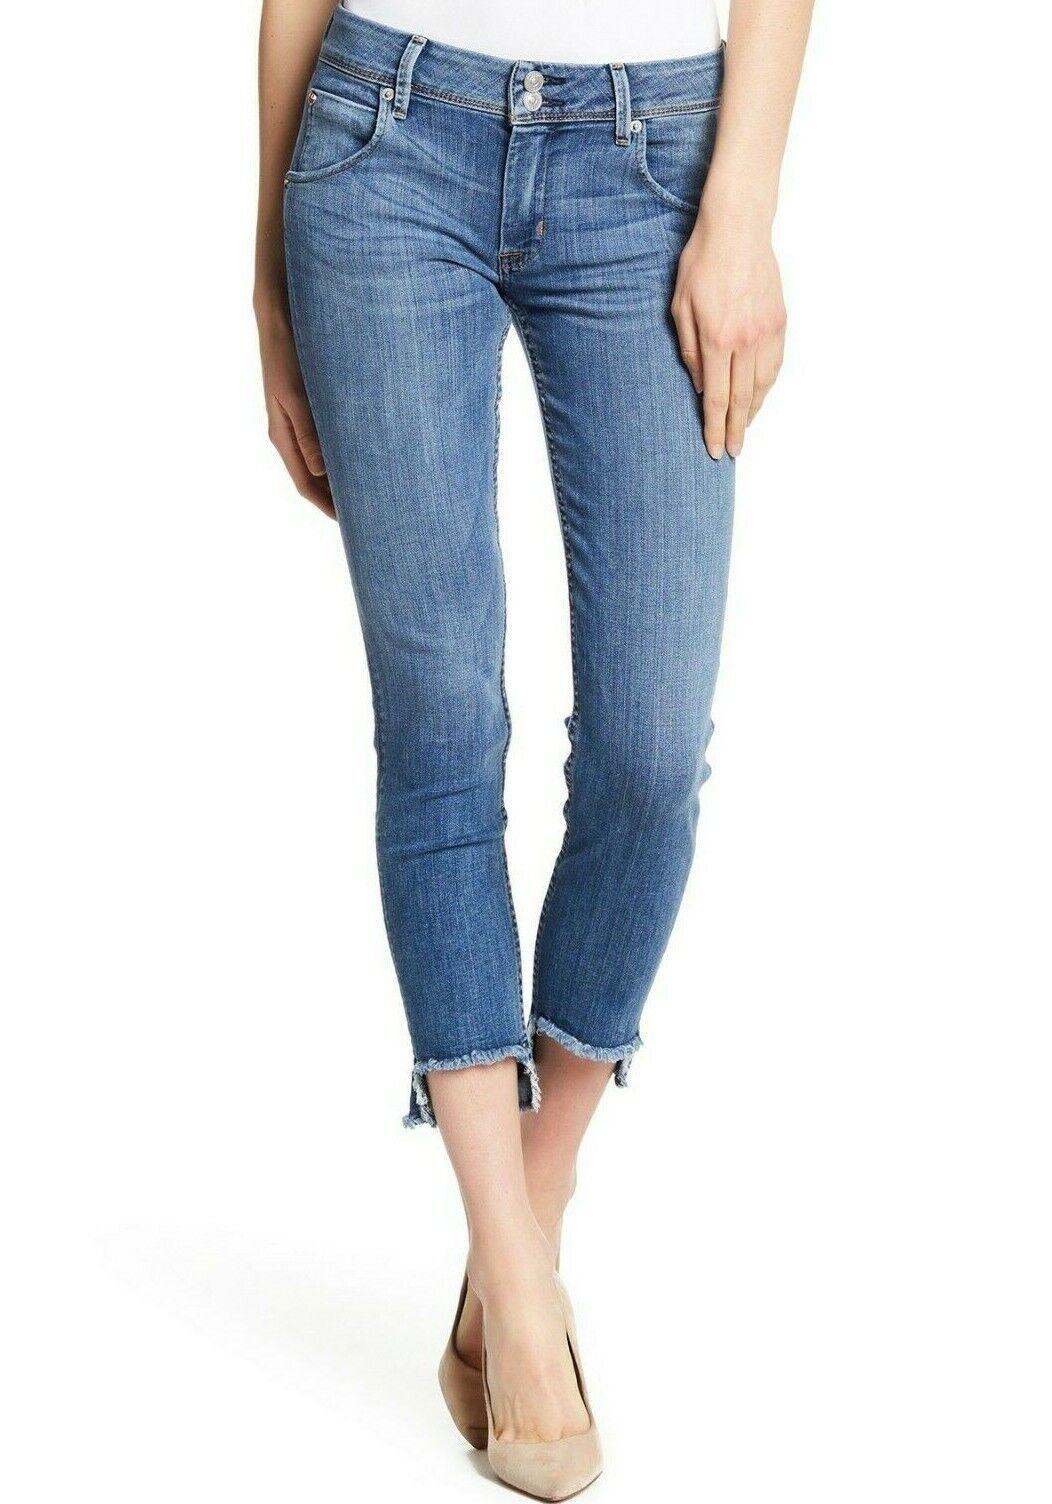 Nwt Hudson Sz27 Katze Ausgefranst Schritt-Saum Midrise Dünn Jeans Stretch